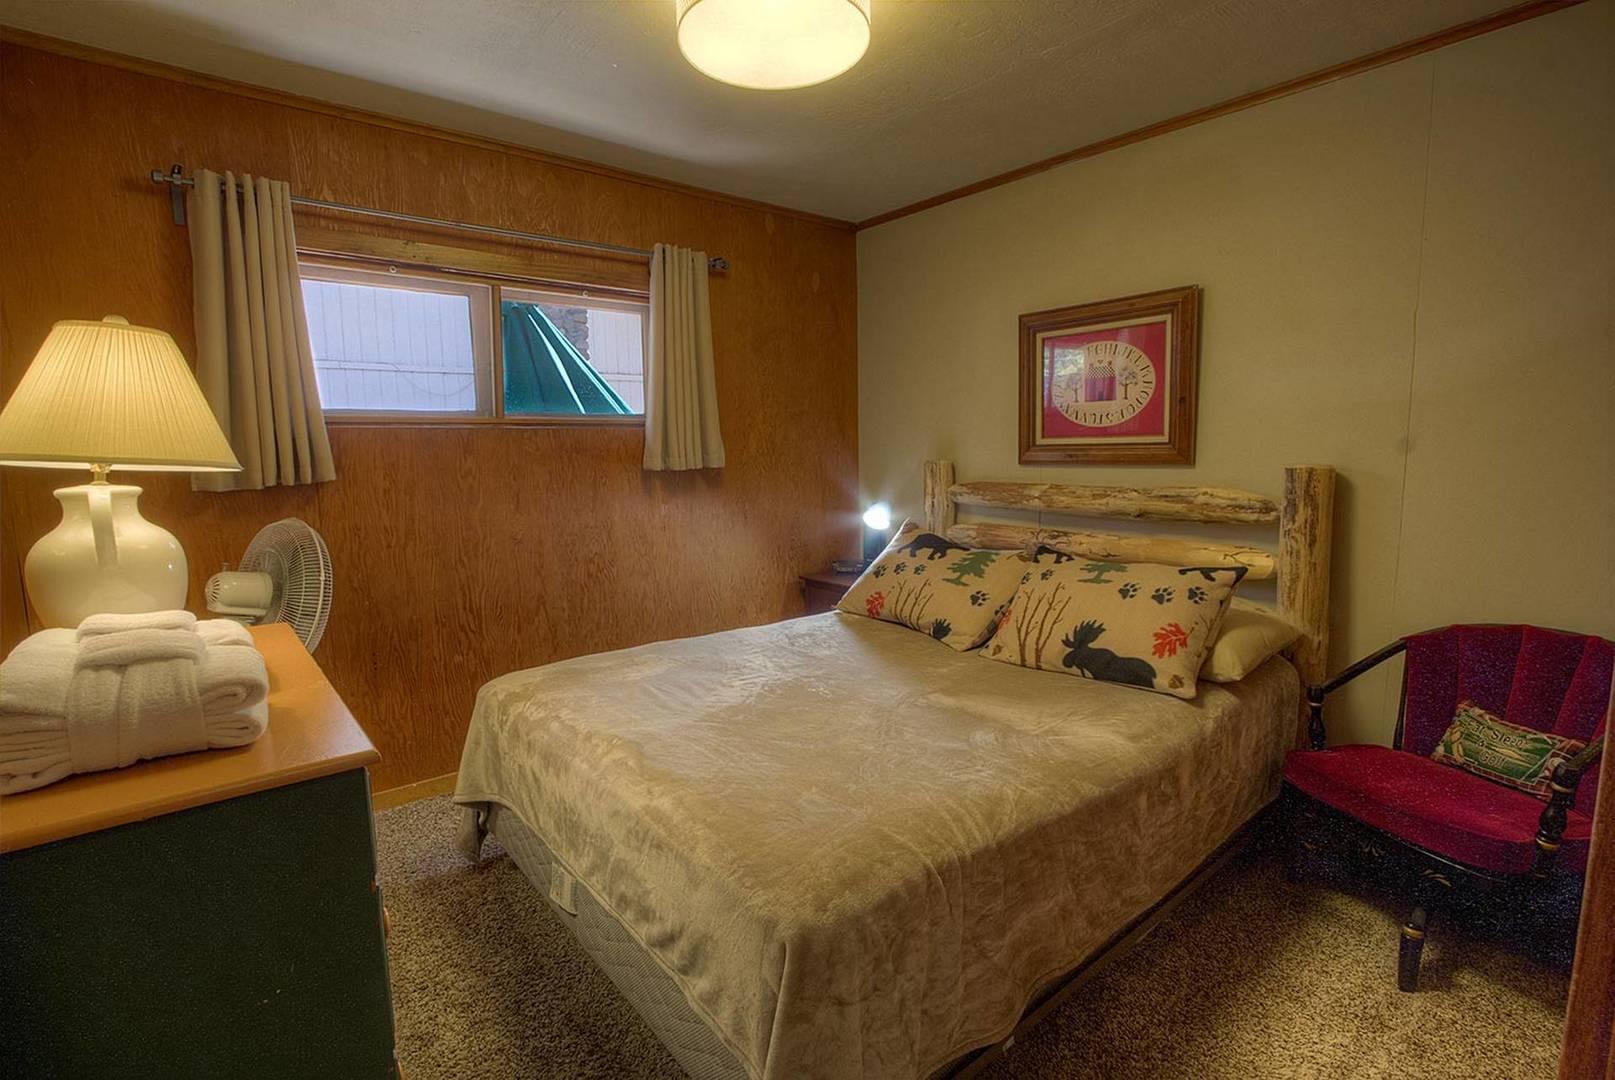 cyh1001 bedroom